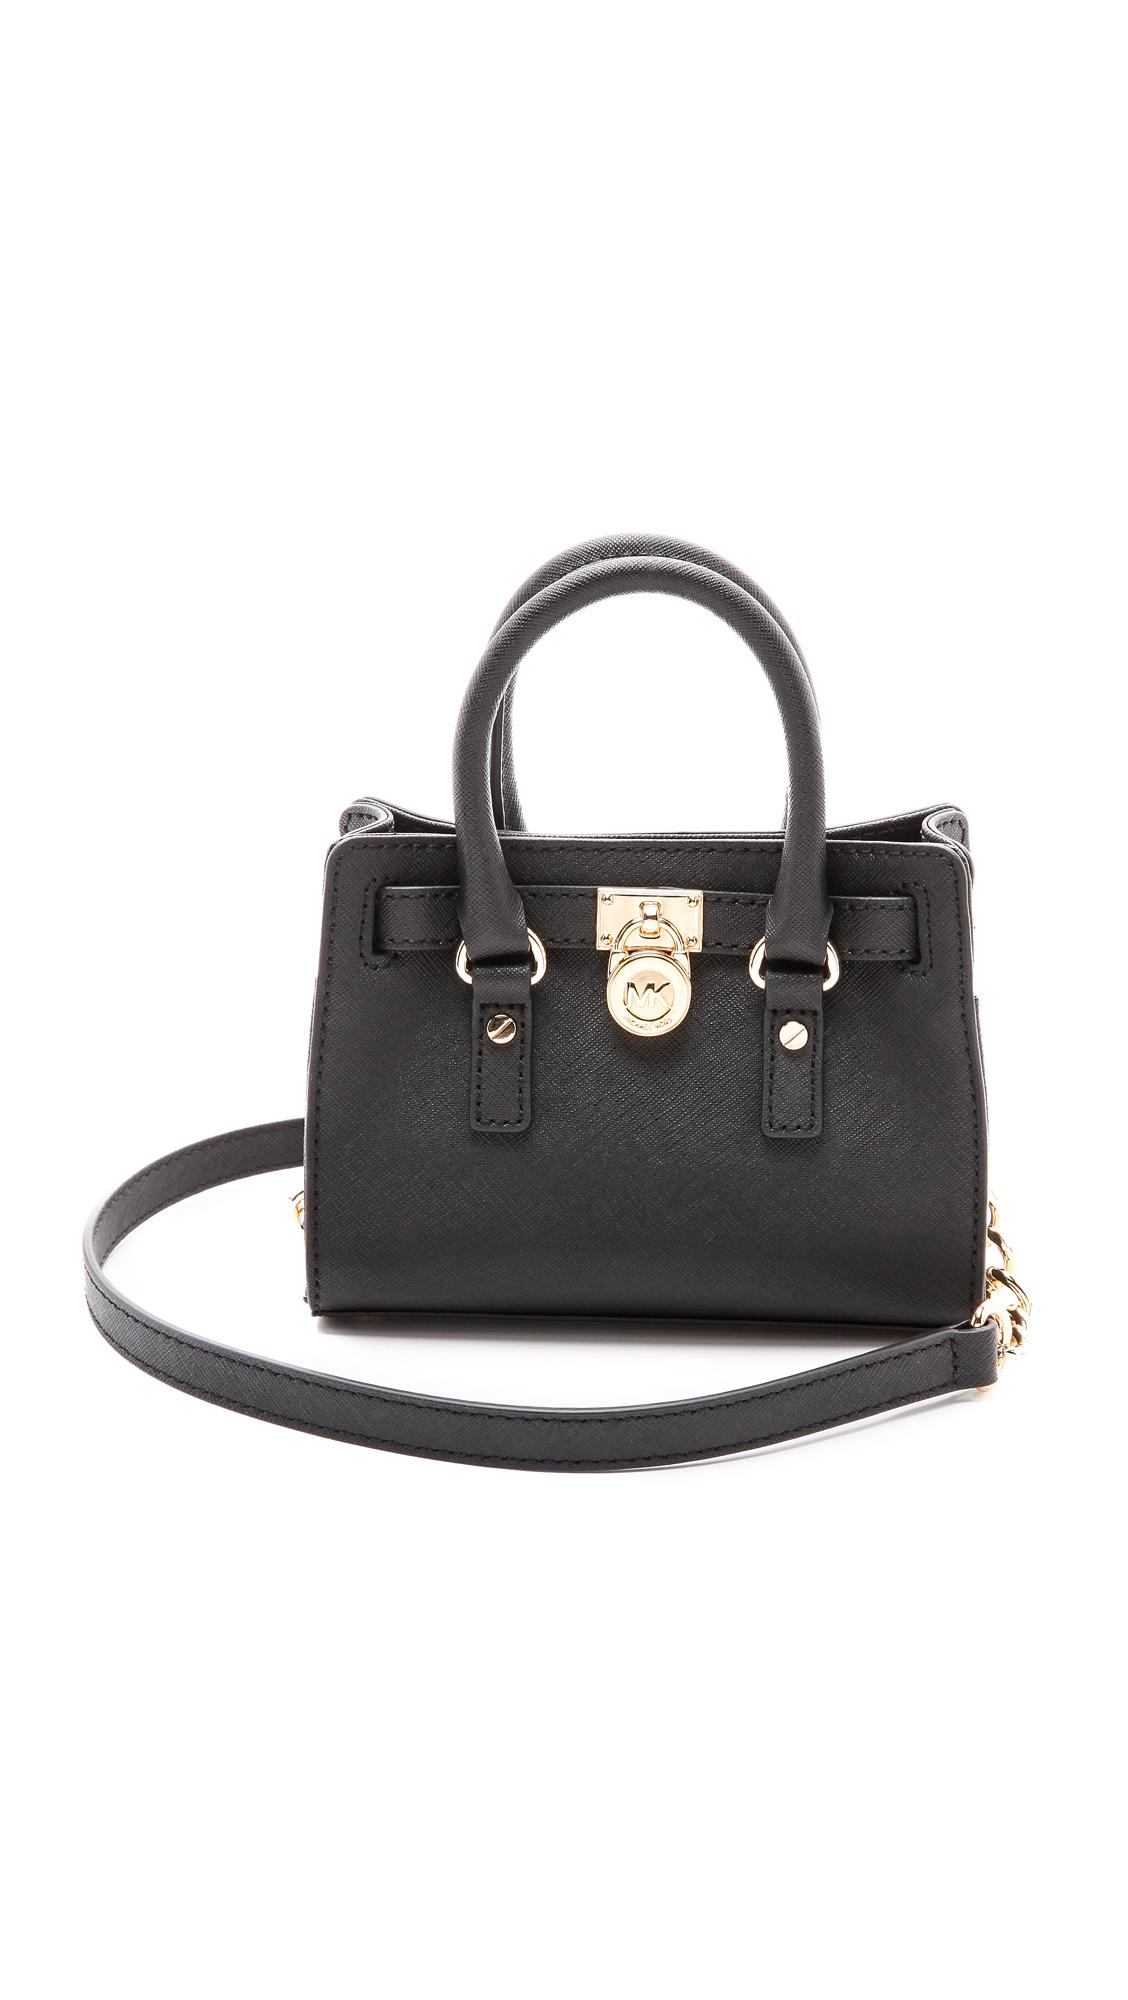 1b8ae63235c4 Buy mk mini bag   OFF44% Discounted